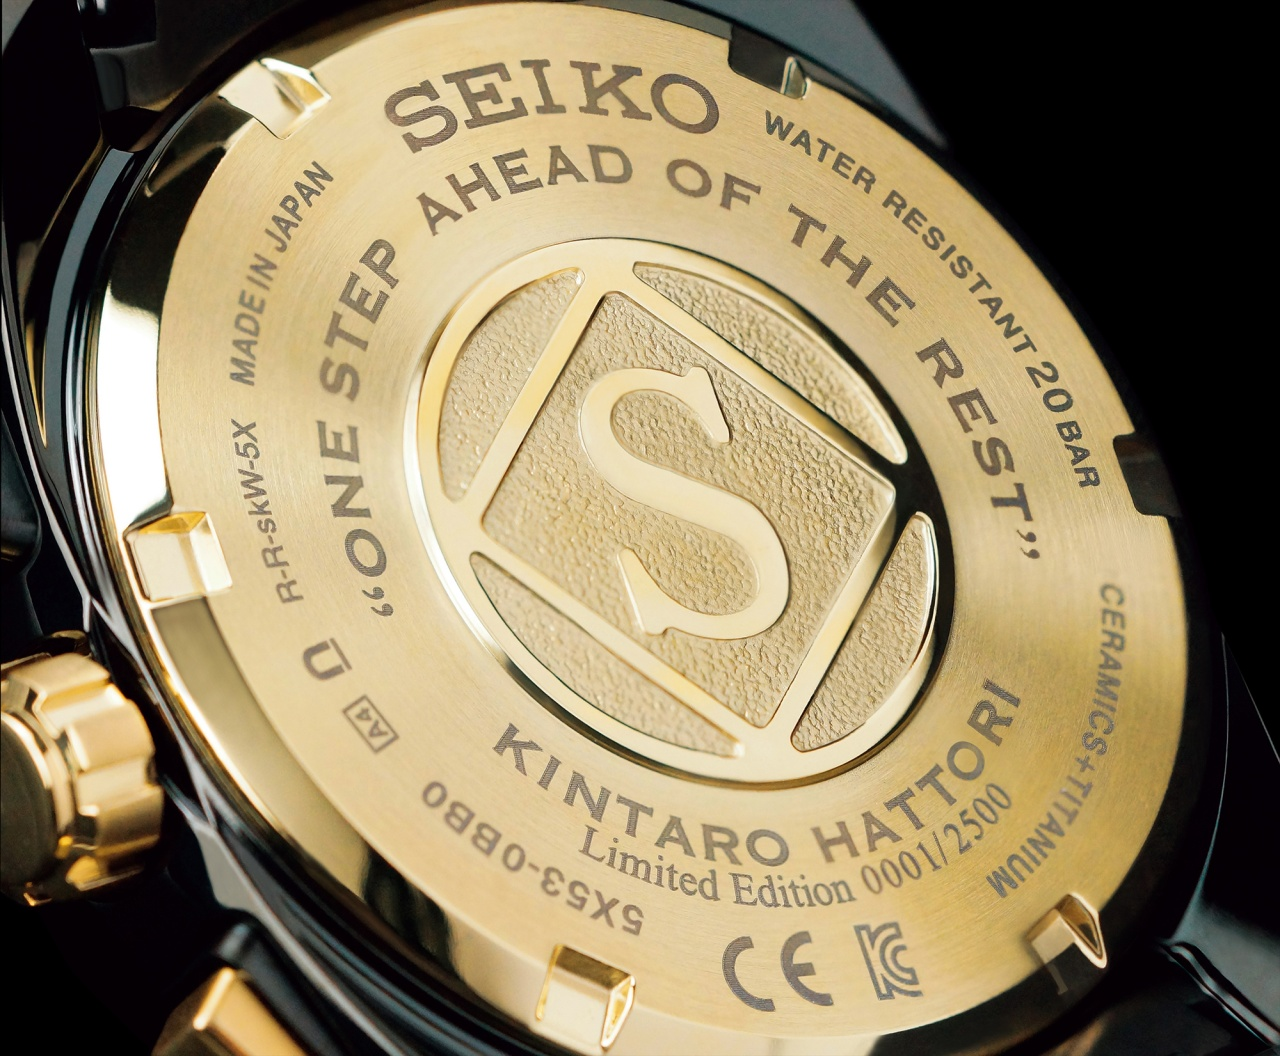 WATCH THIS|第三次革命?SEIKO ASTRON 的致敬錶款將掀起波瀾